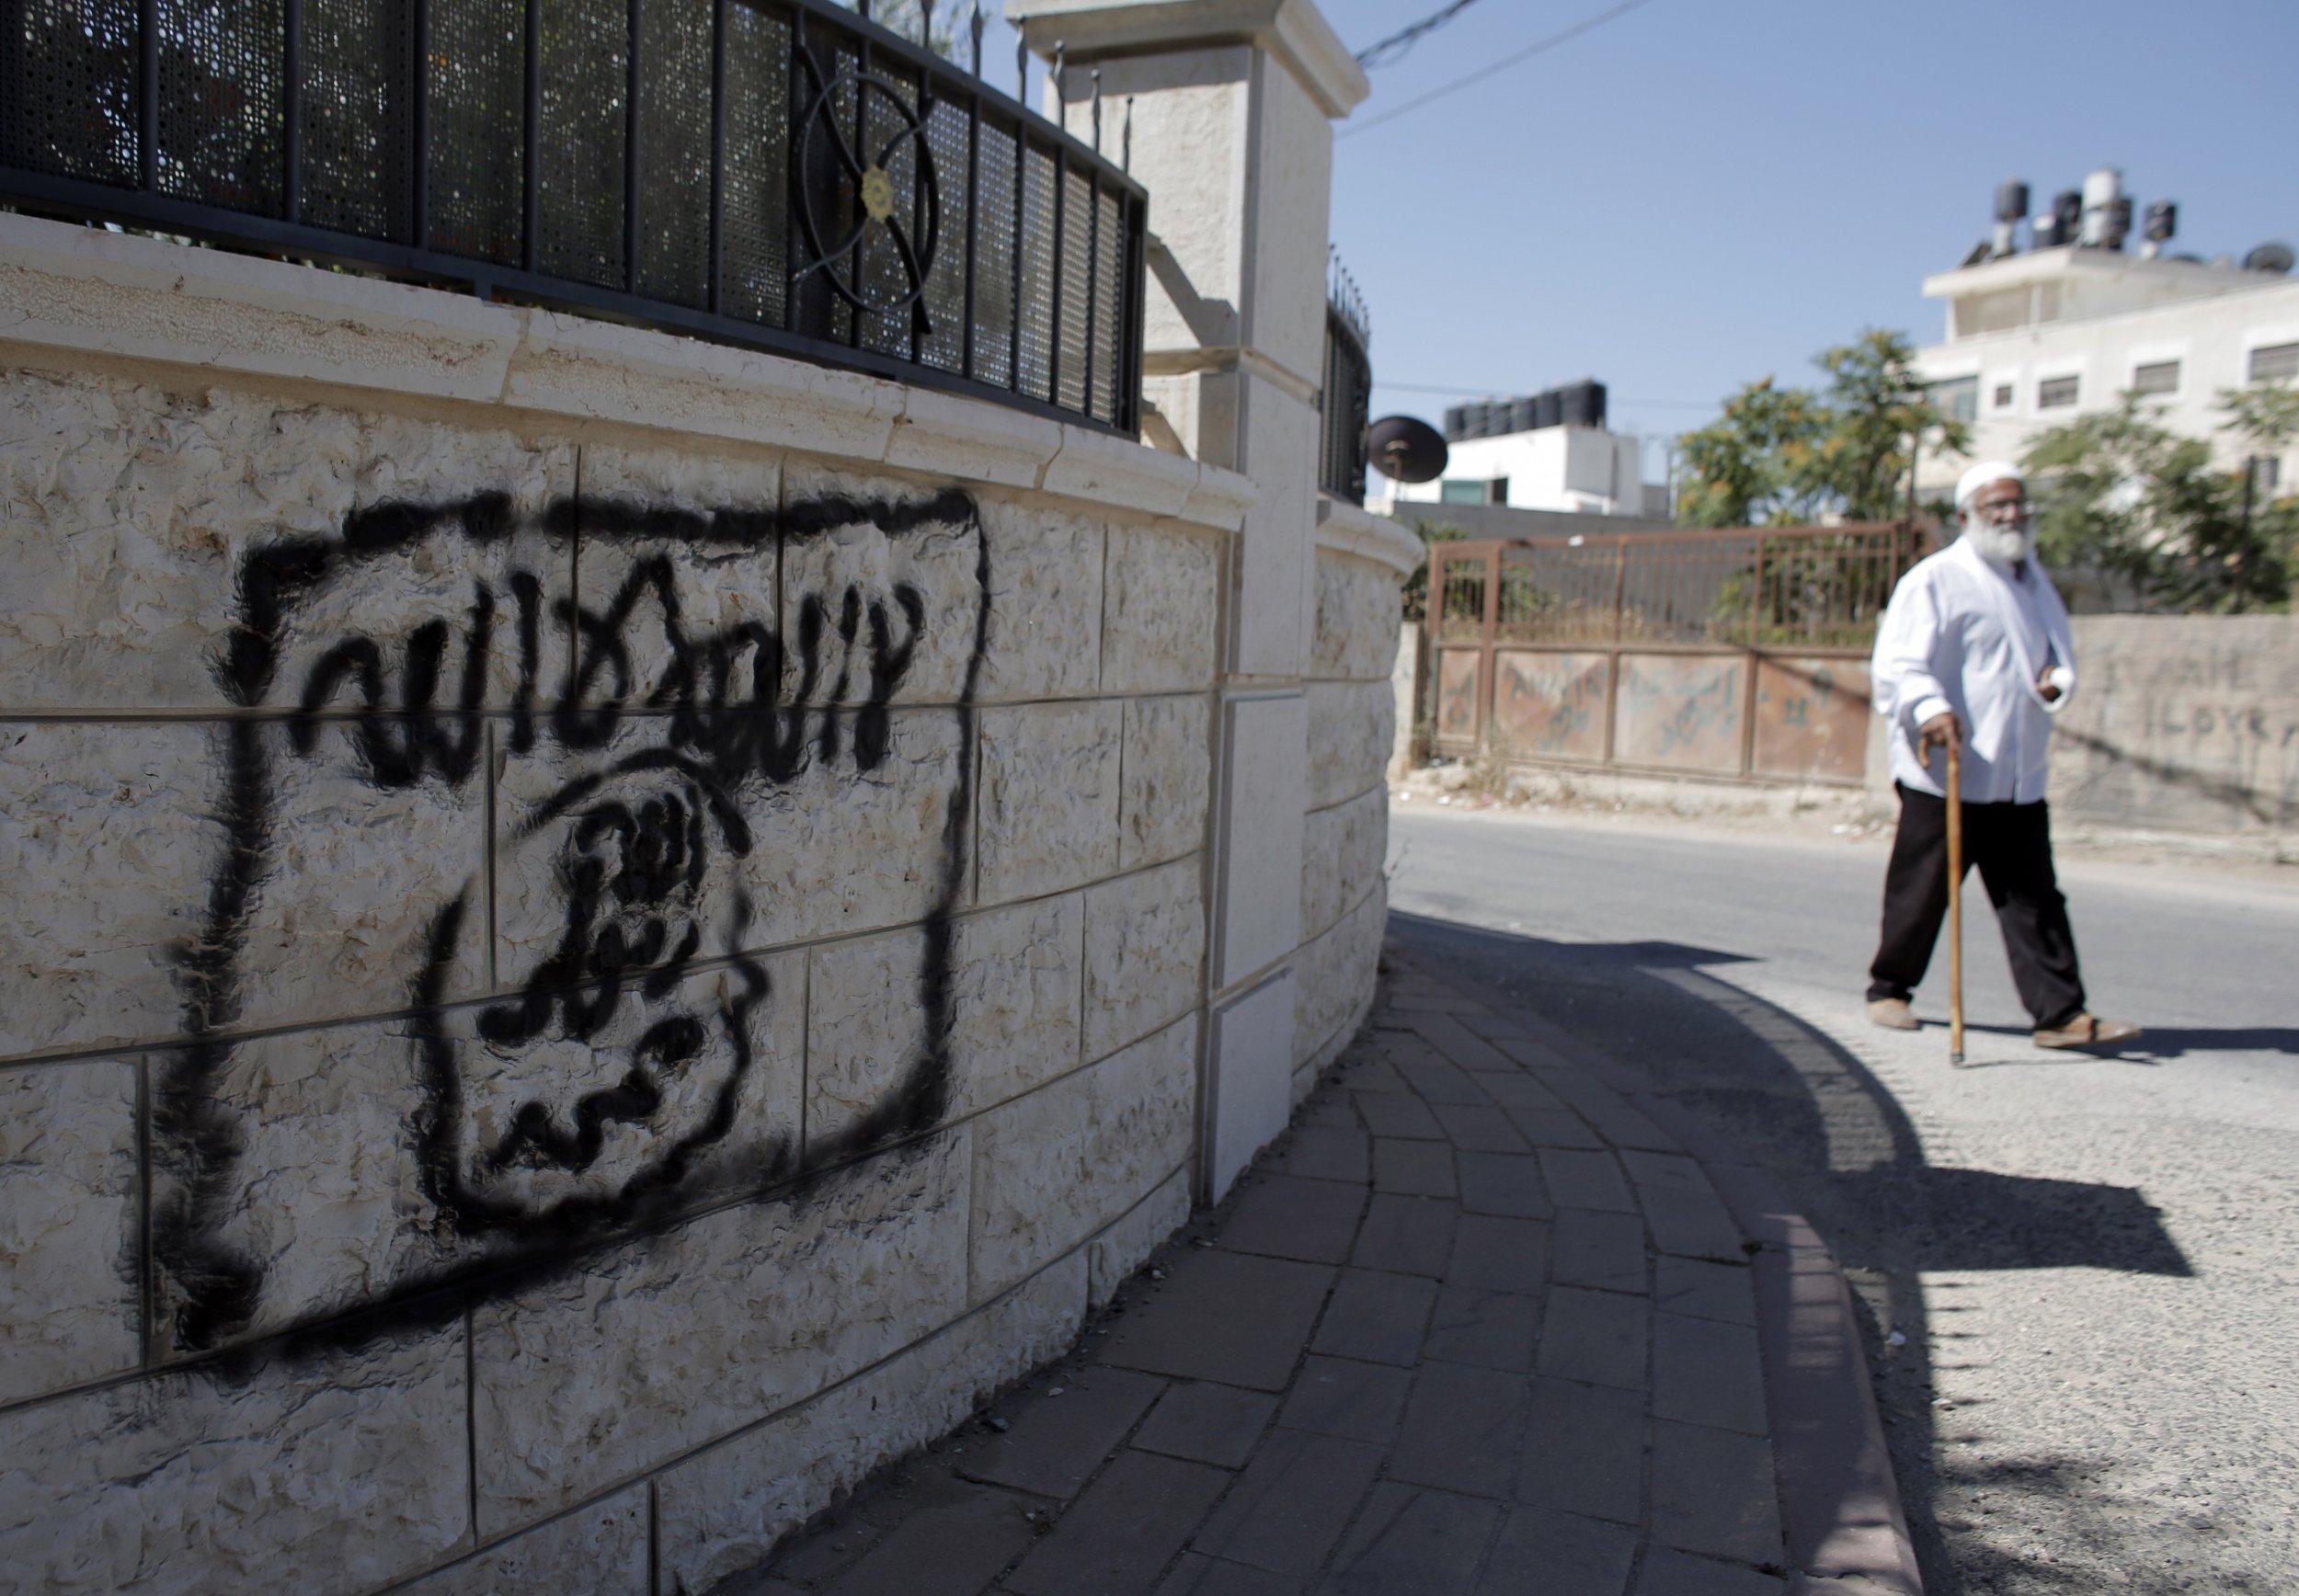 ISIS flag graffiti in East Jerusalem